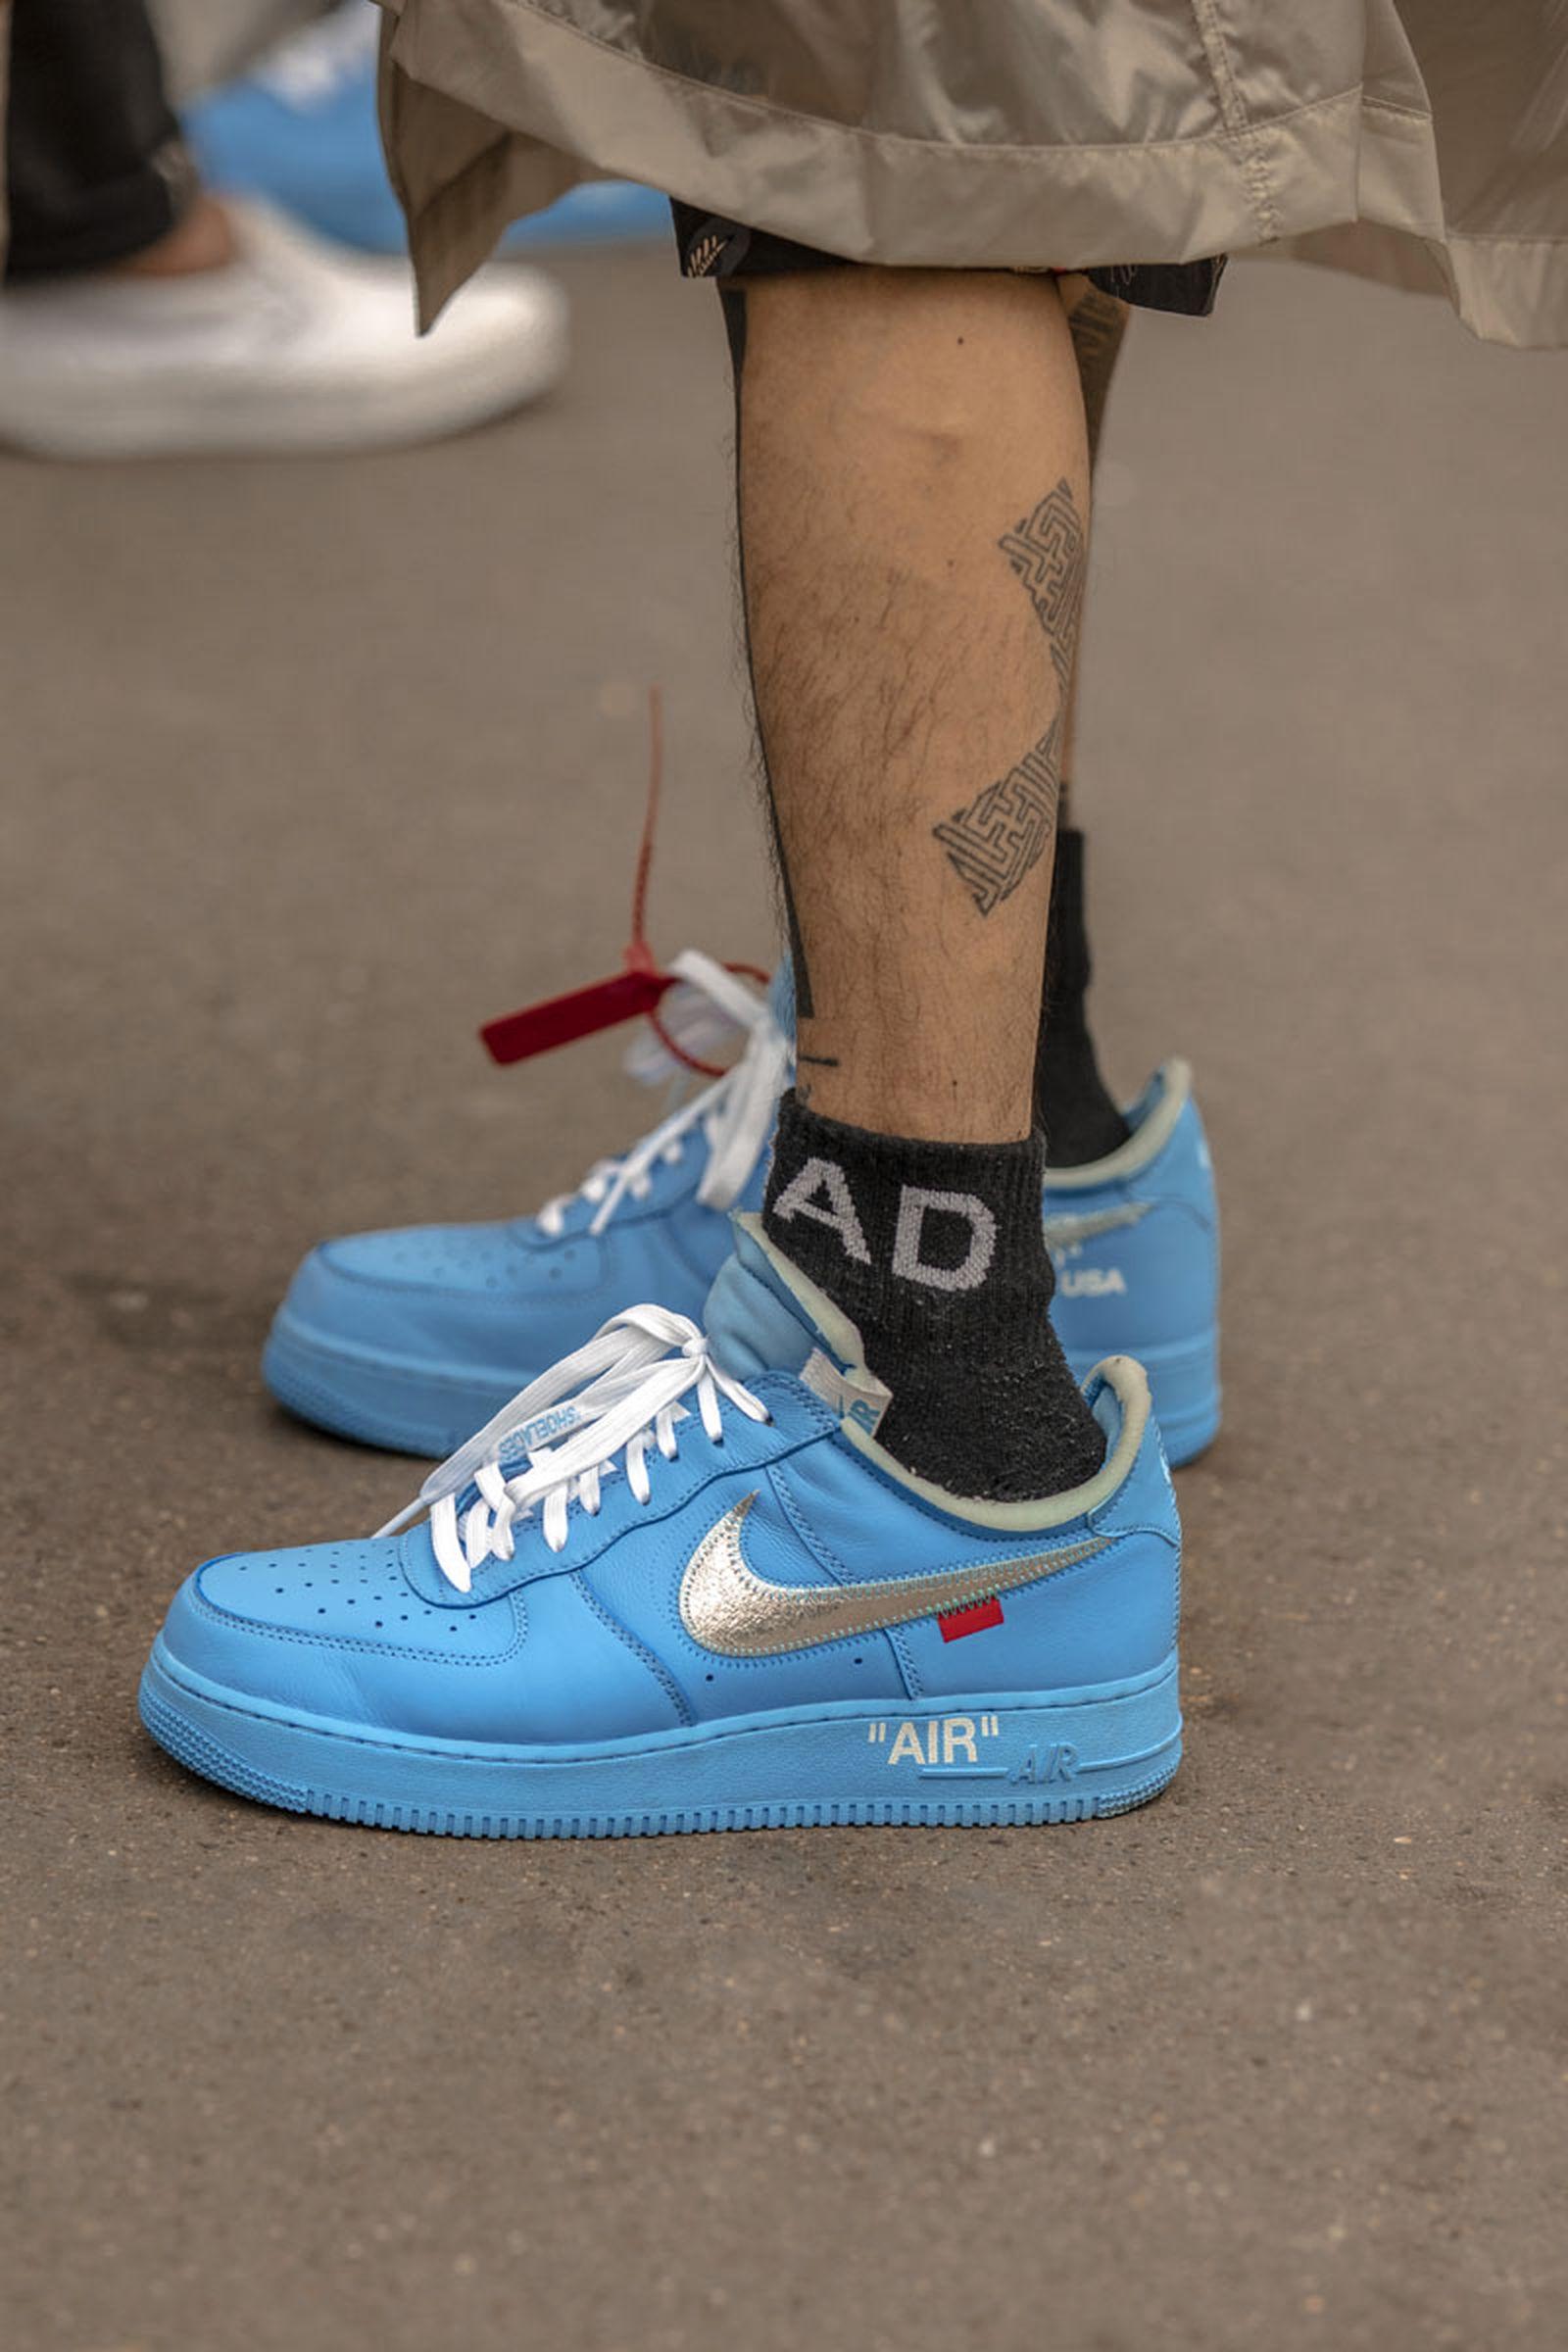 paris fashion week ss20 sneakers 03 Nike comme des garcons li ning